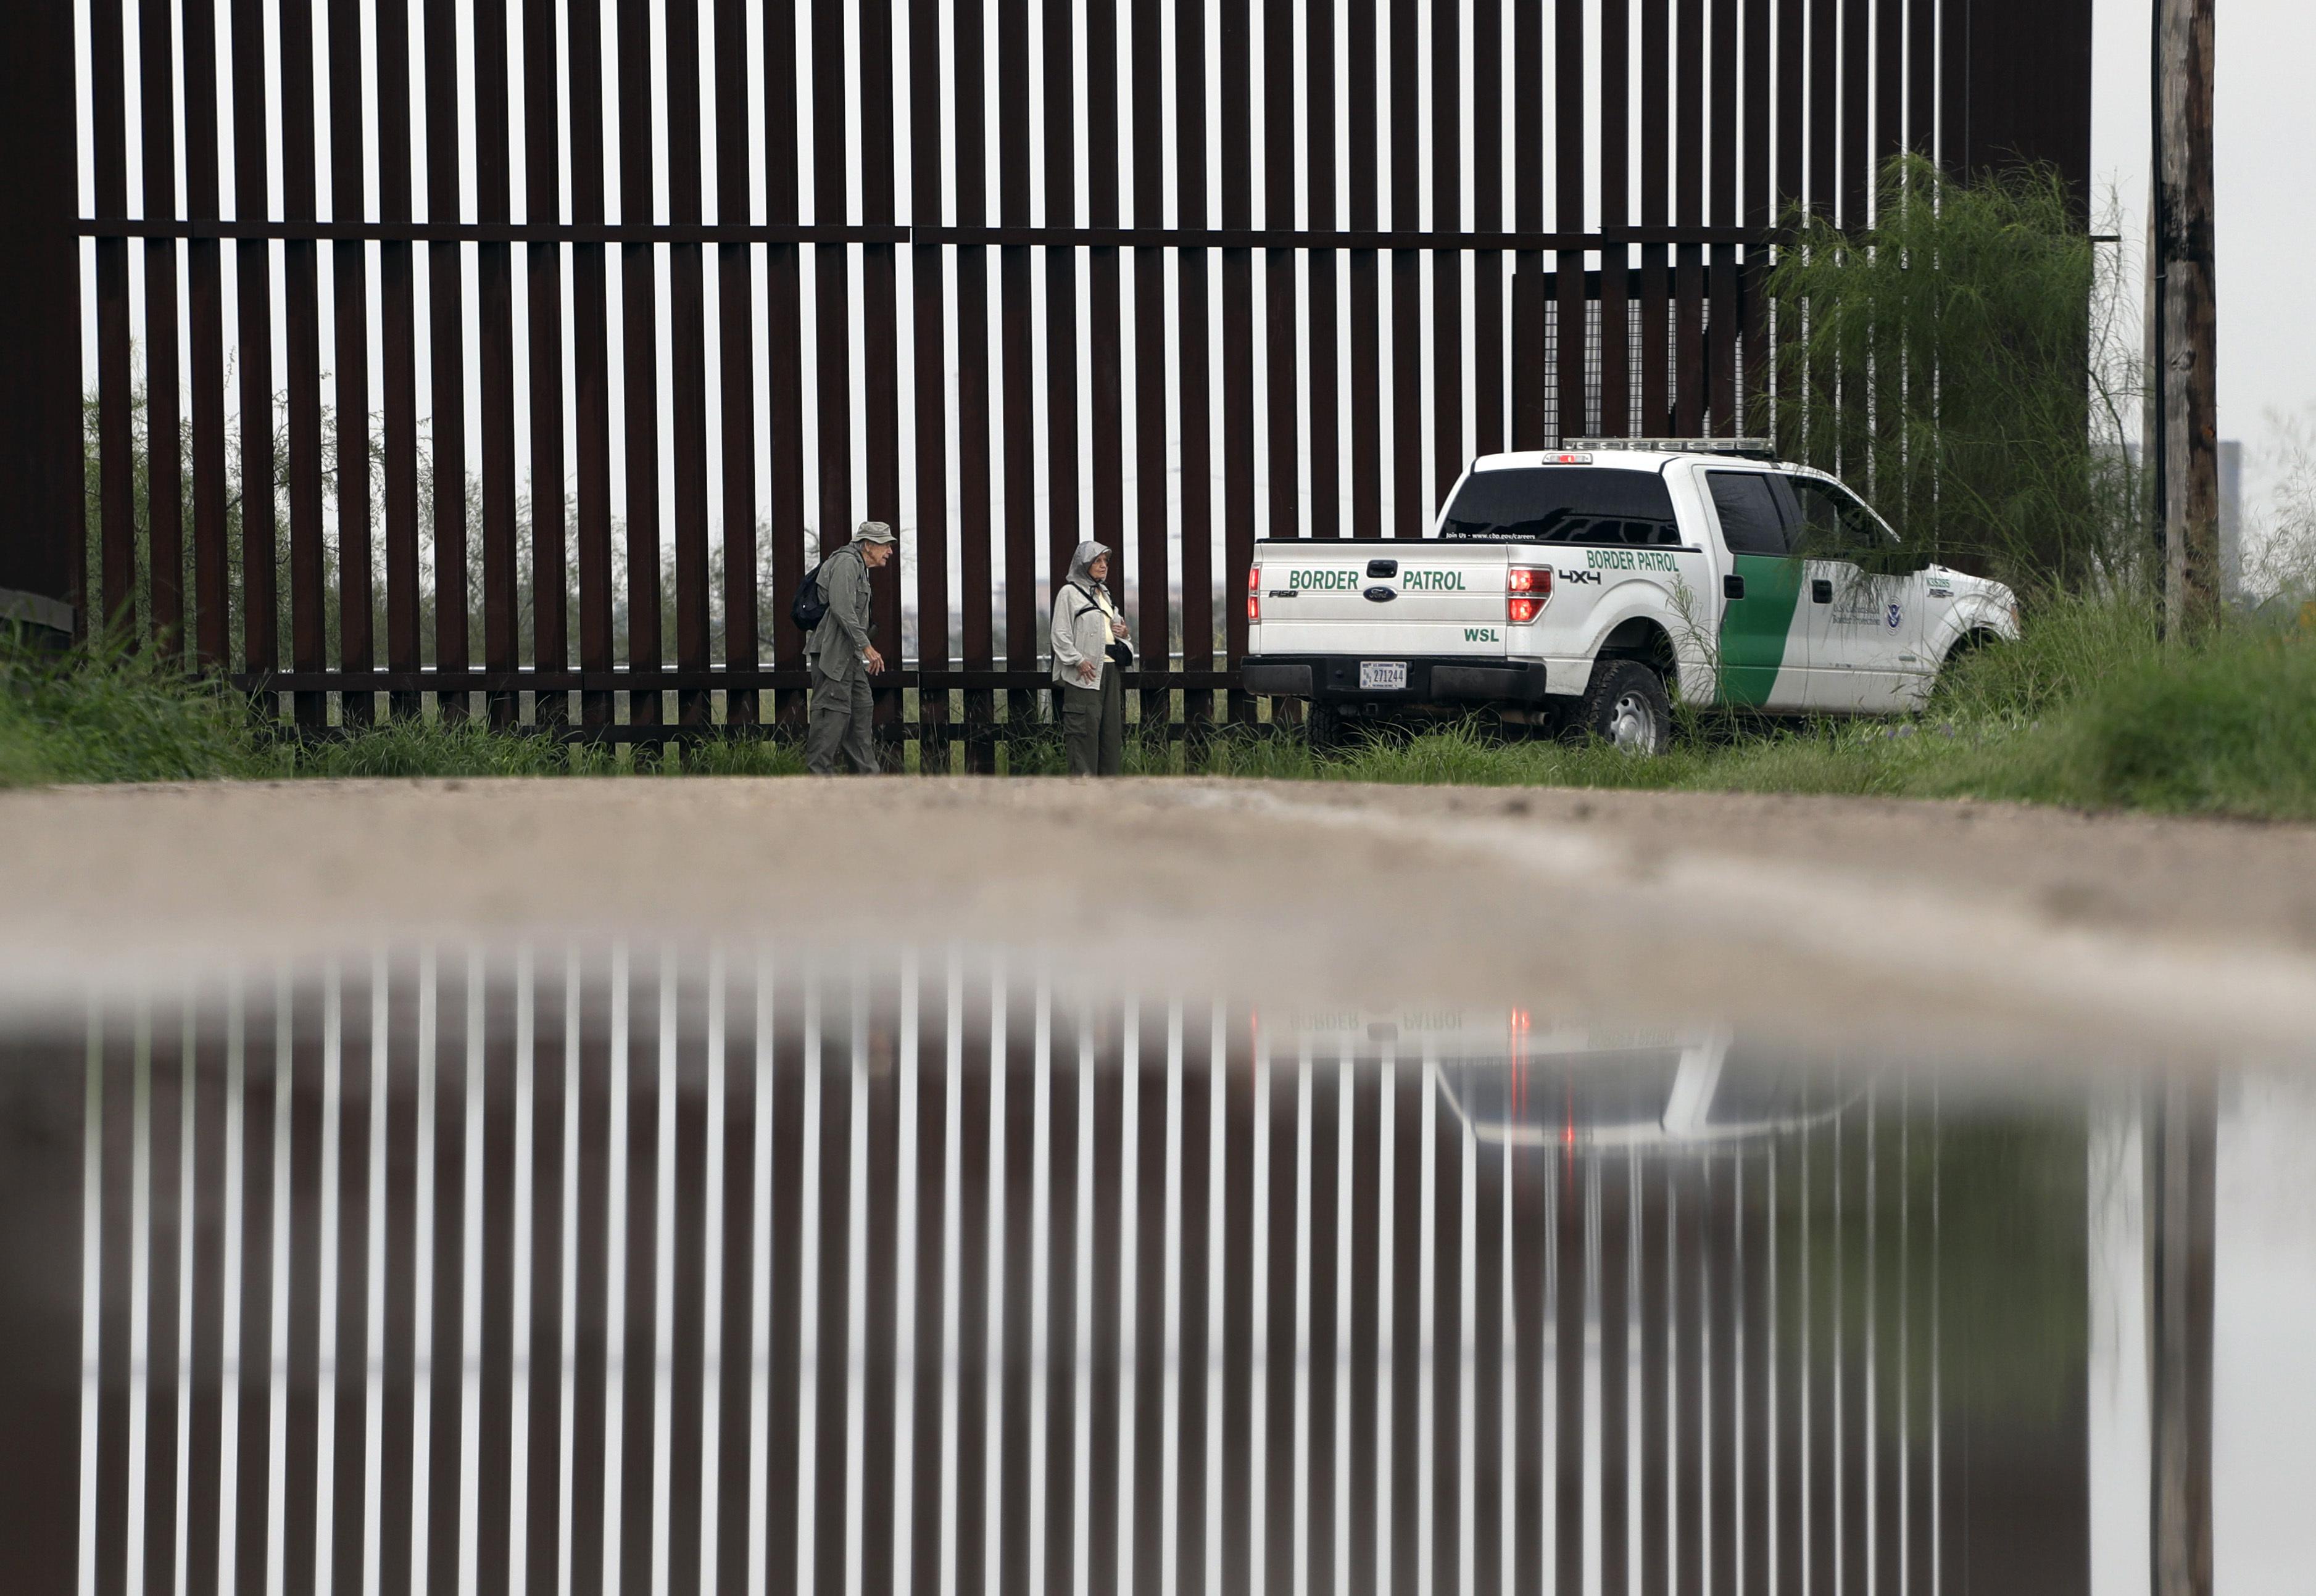 washingtonexaminer.com - House bill funds $5 billion for wall, adds ICE and Border Patrol agents